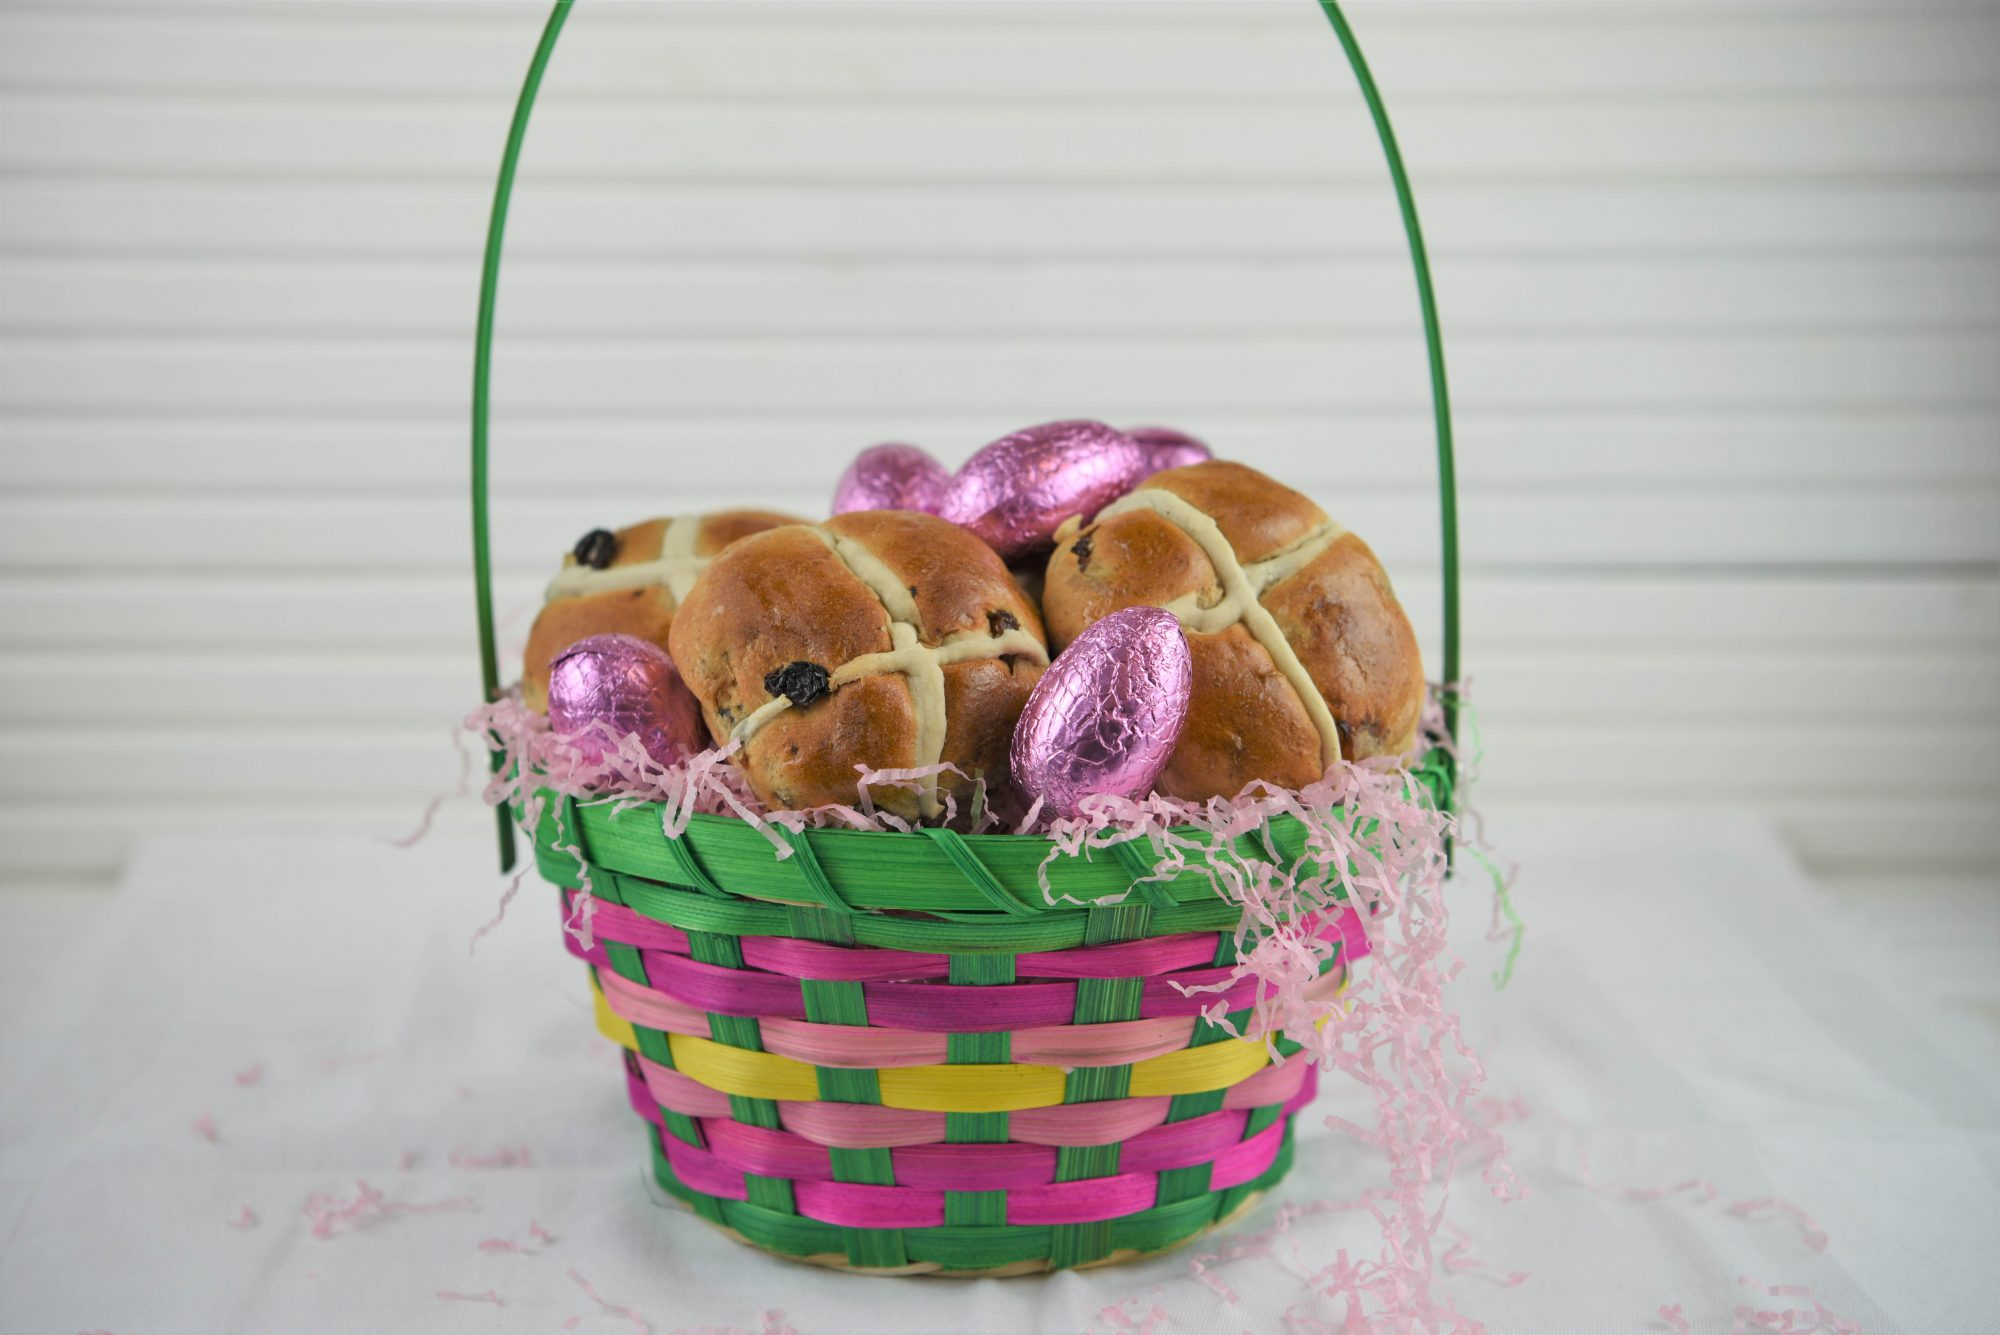 Hot Cross Buns Easter Basket Getty 12/18/19